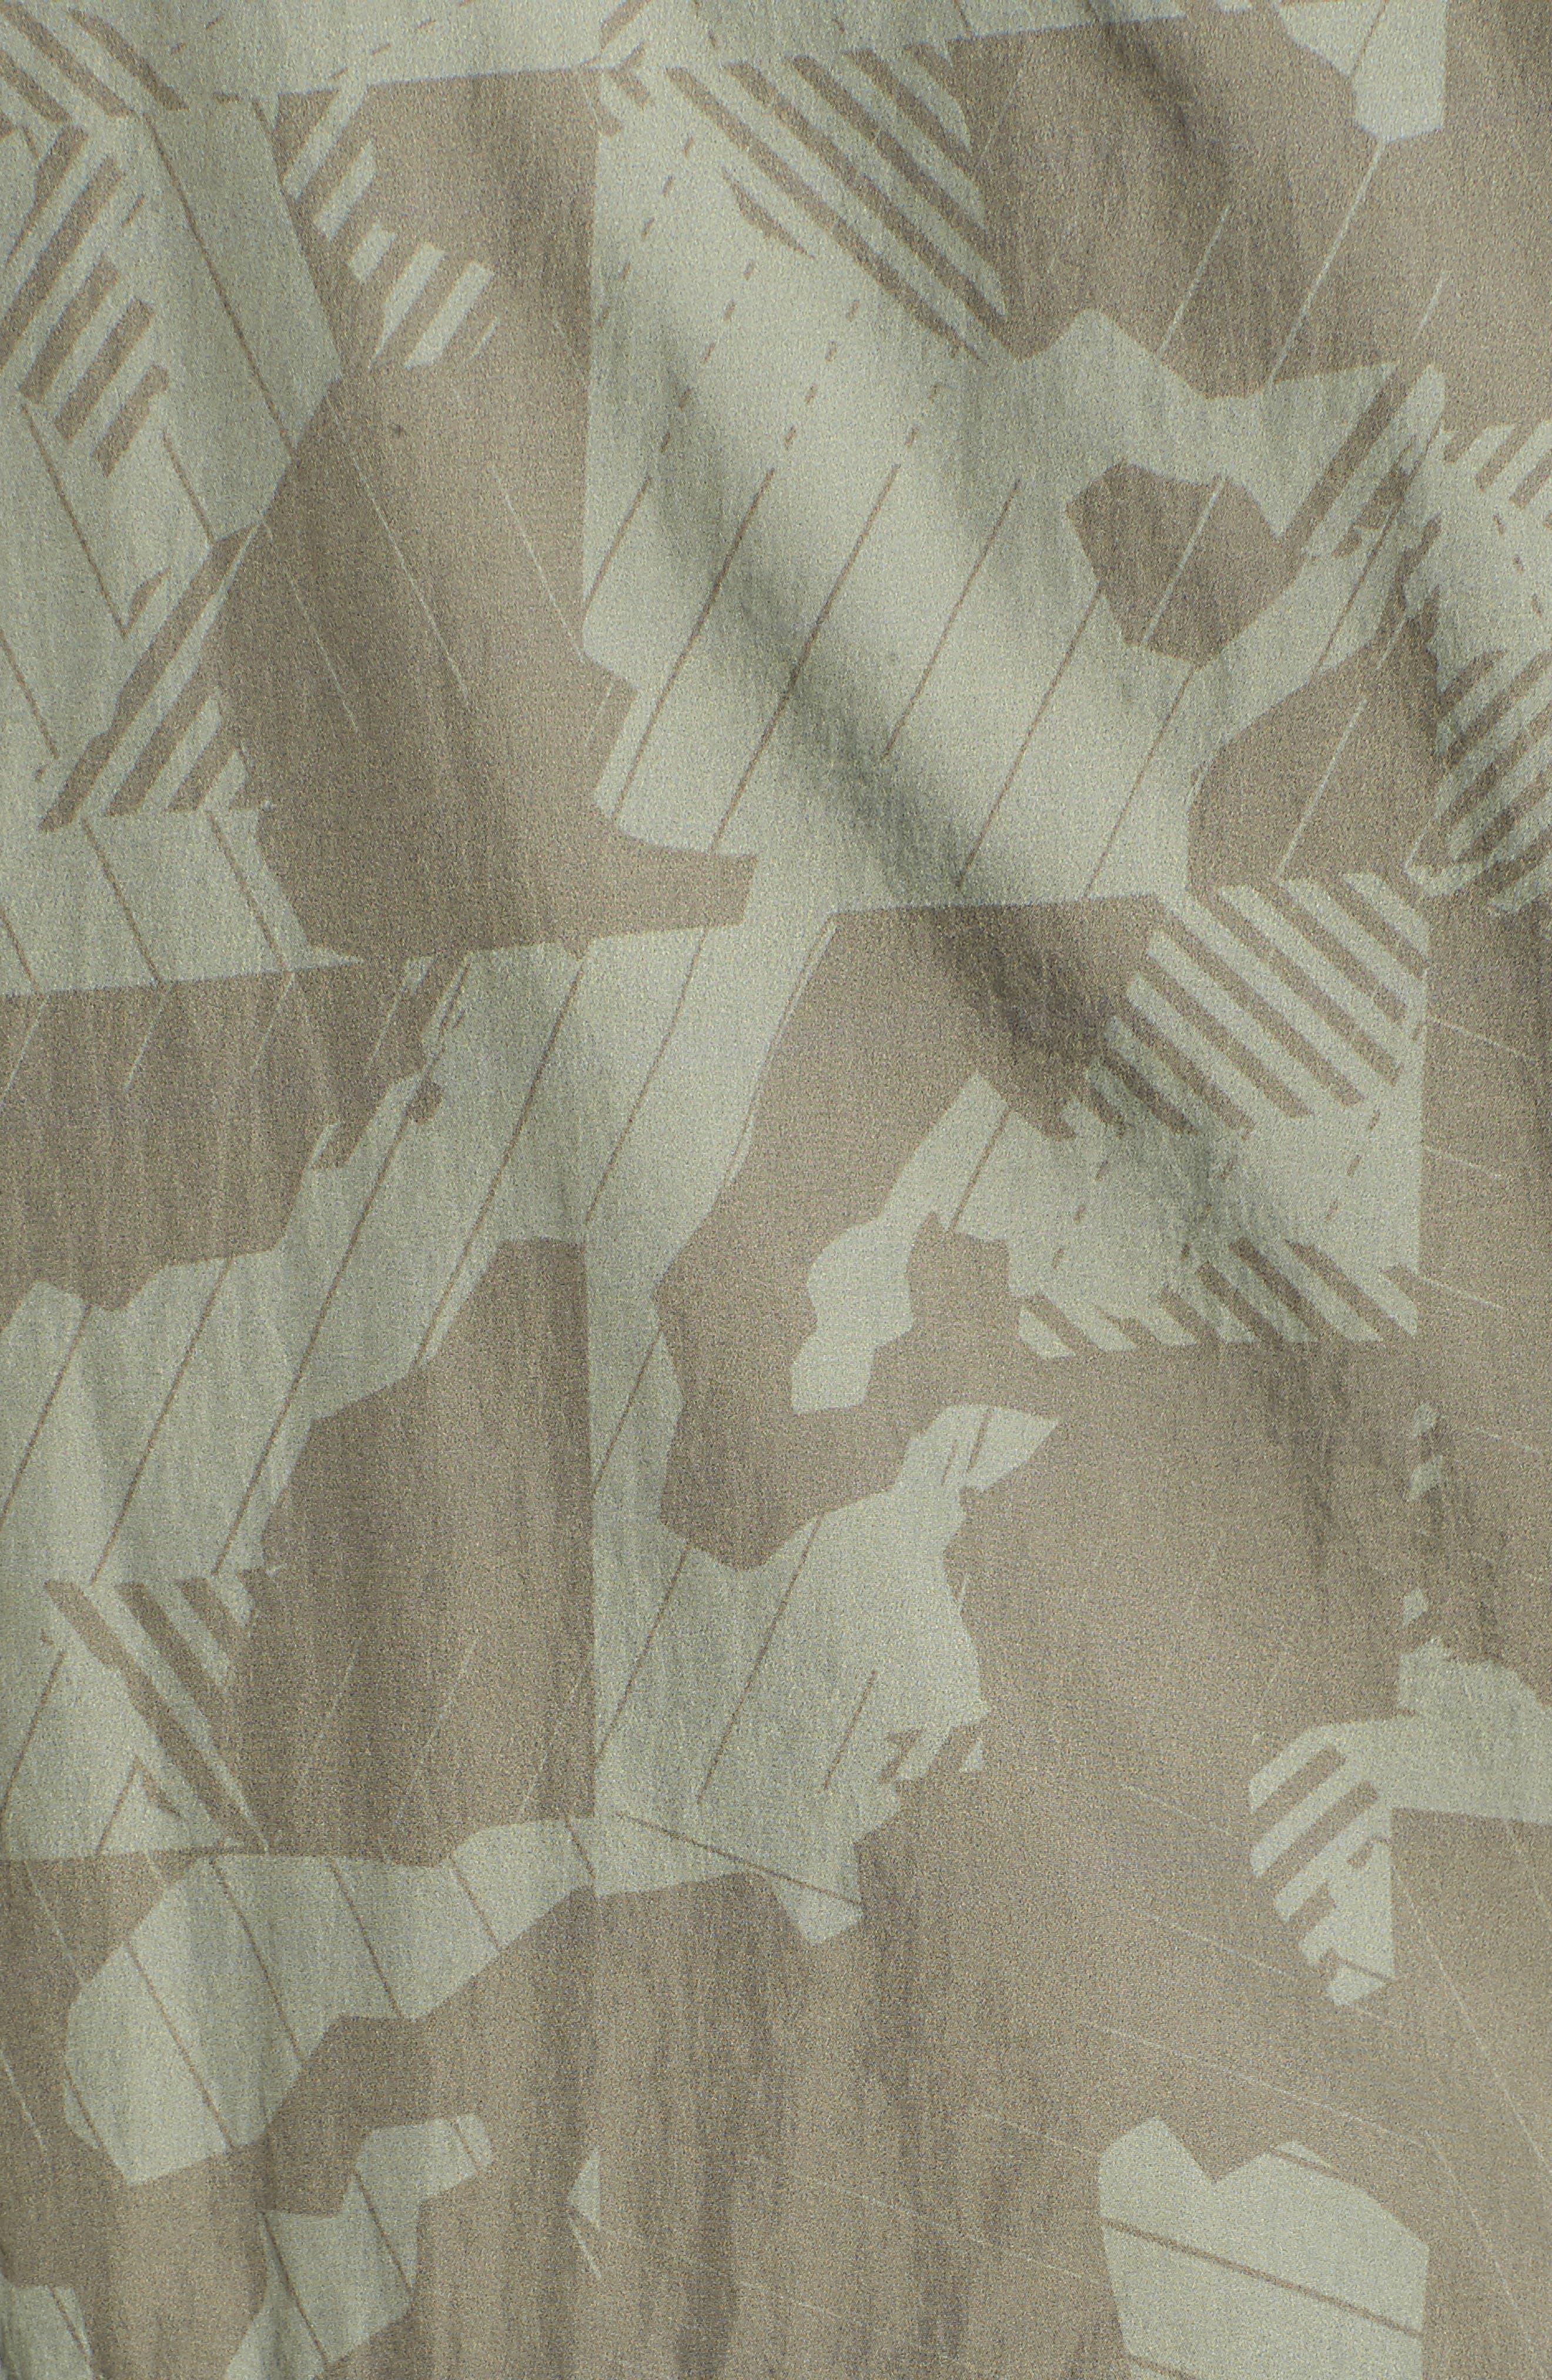 Camo Windbreaker Jacket,                             Alternate thumbnail 5, color,                             Bungee Cord Camo